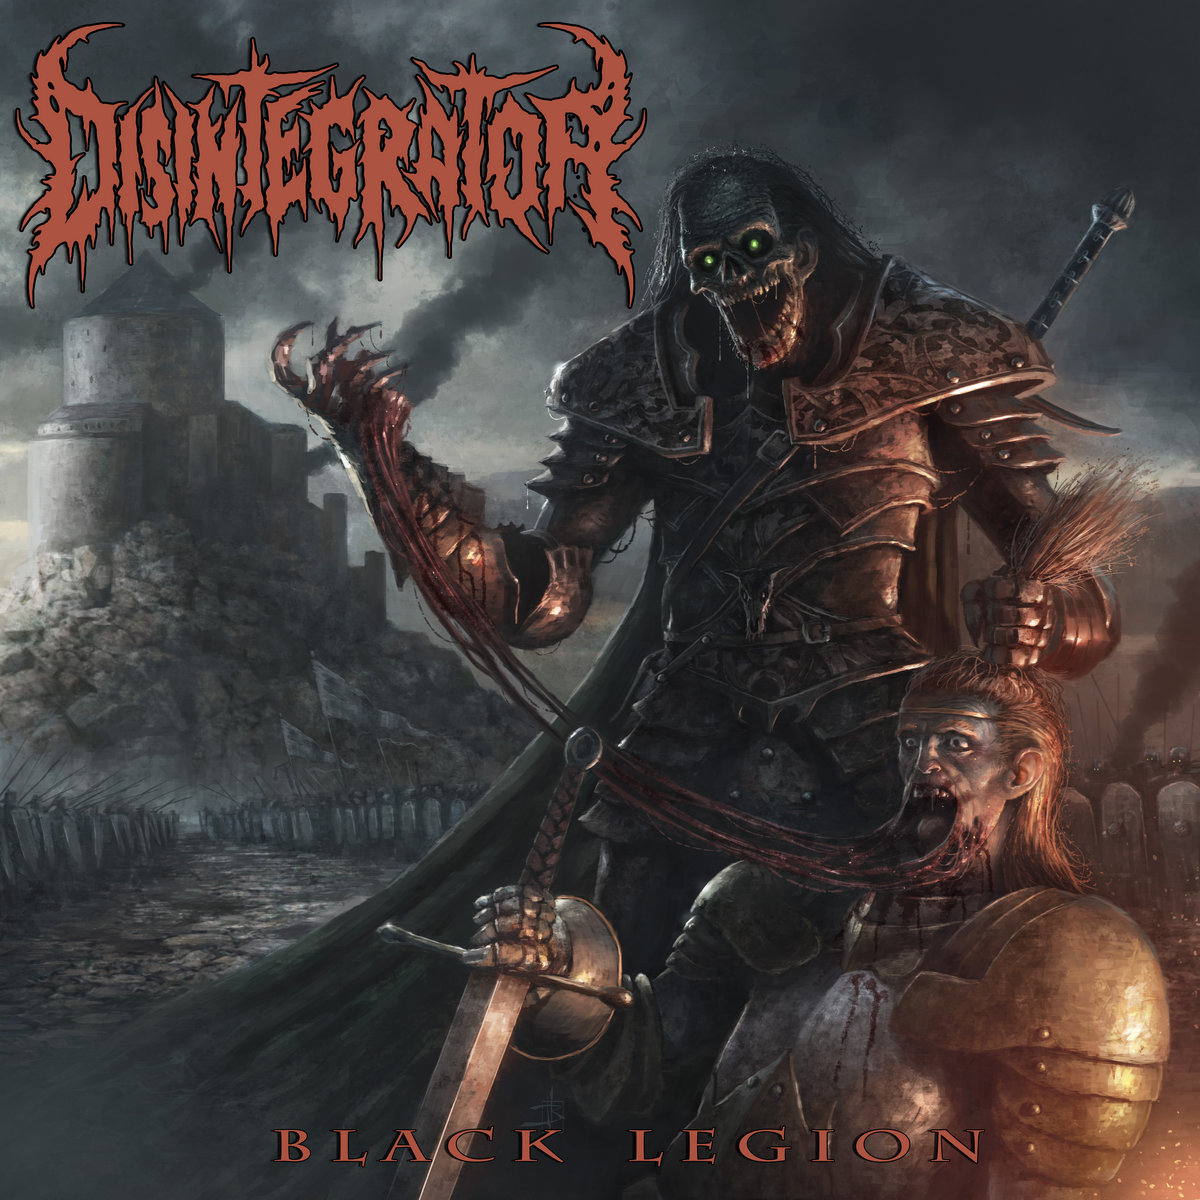 Resultado de imagem para Disintegrator - Black Legion